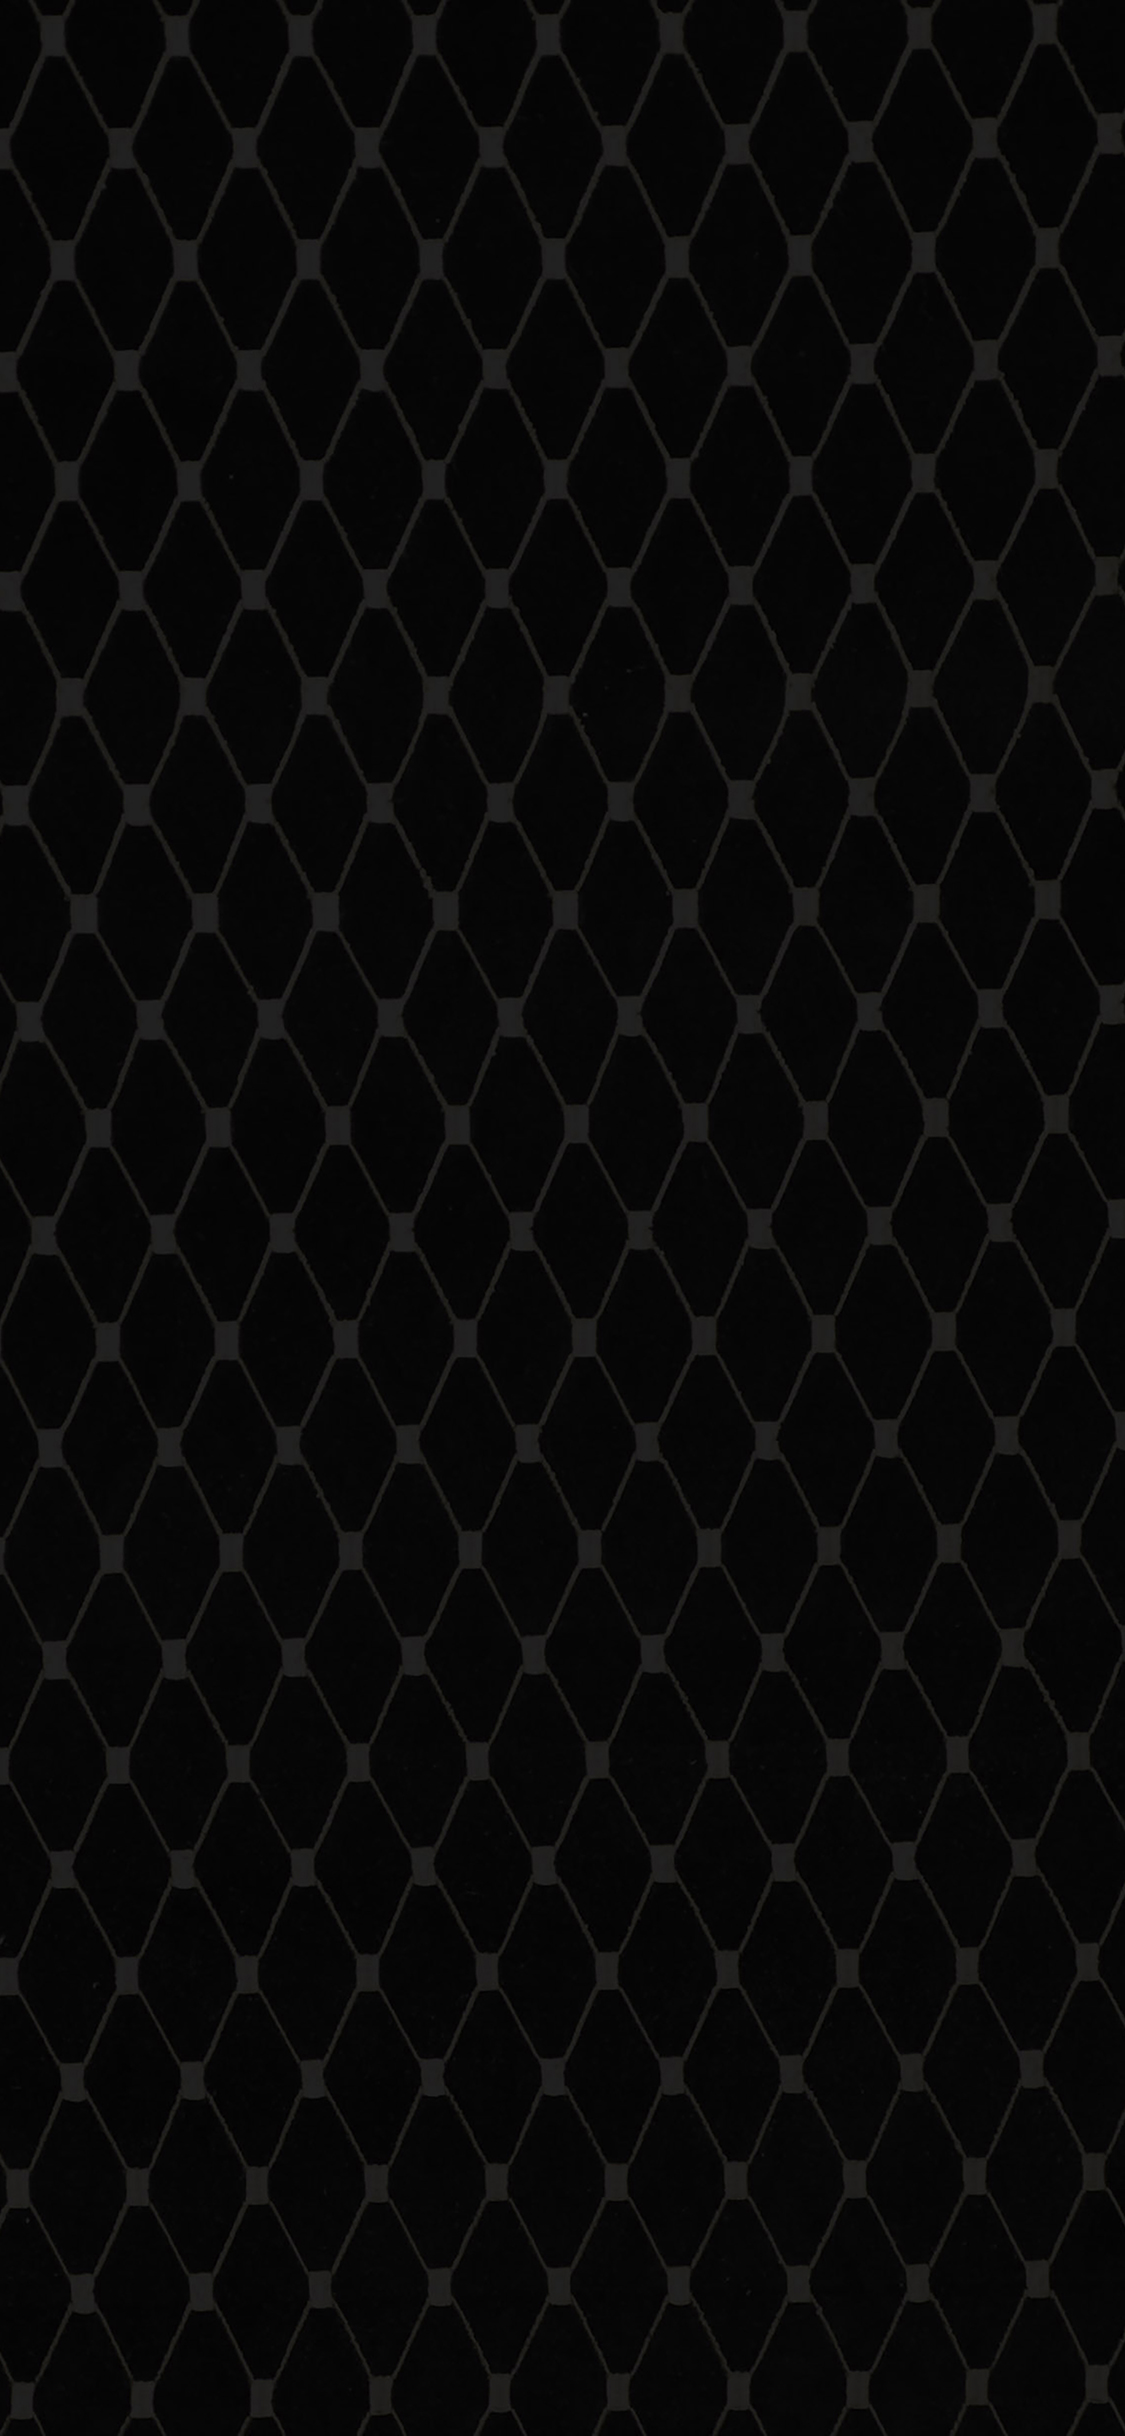 vb23-wallpaper-bang-goo-dark-pattern - Papers.co